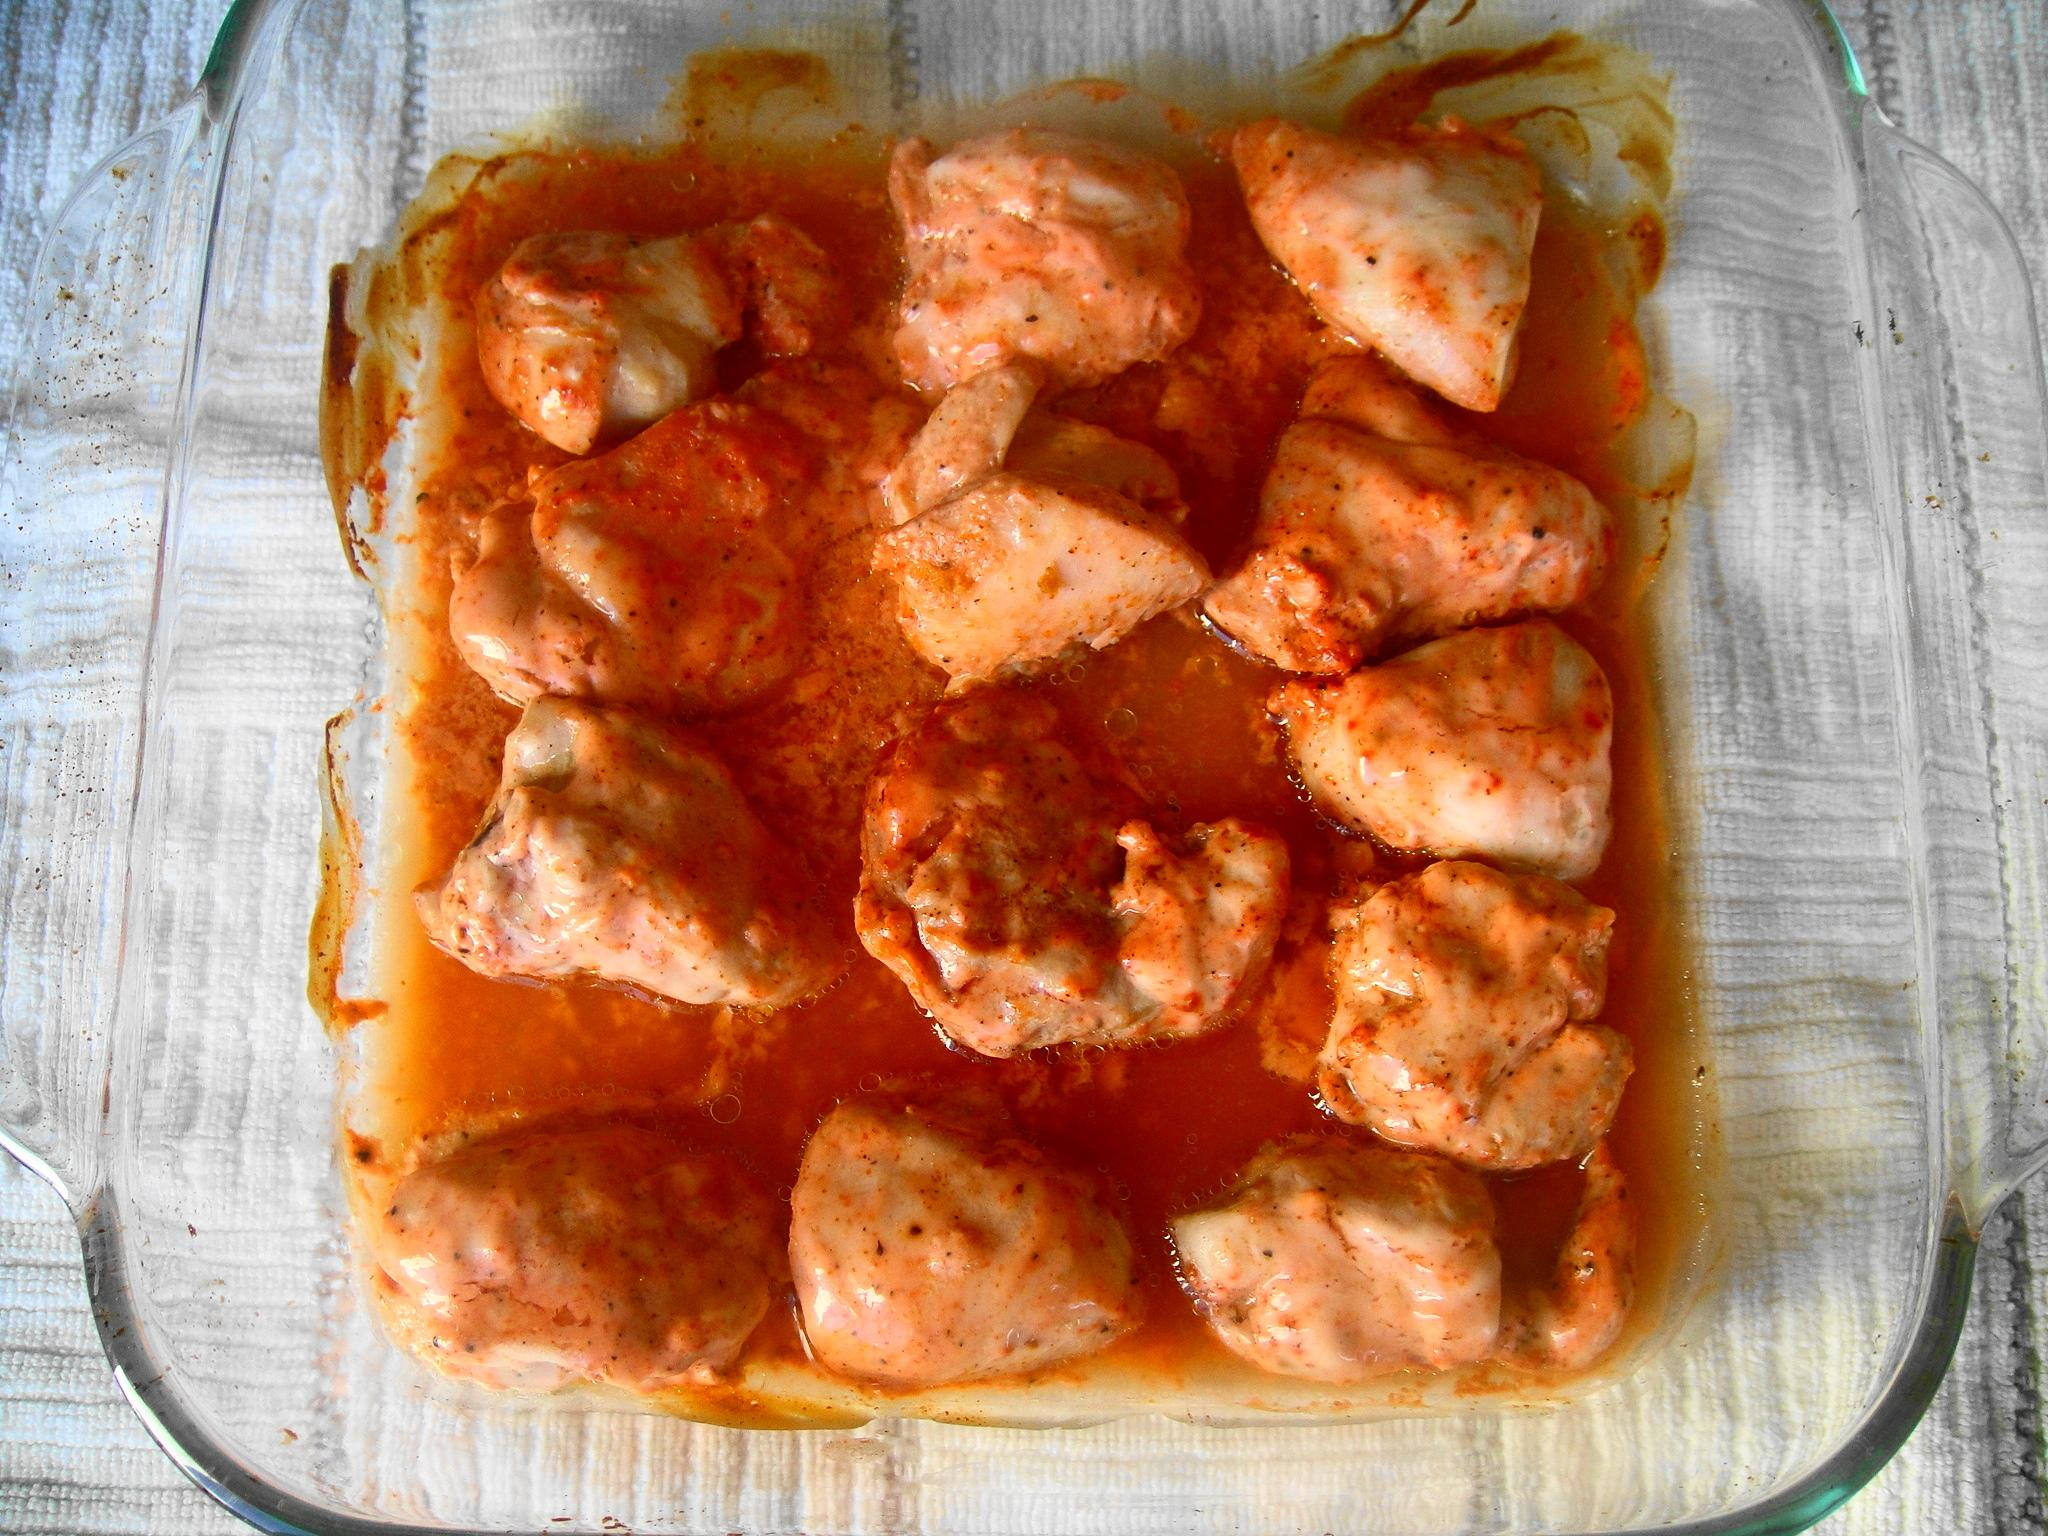 tandoori chicken cooked